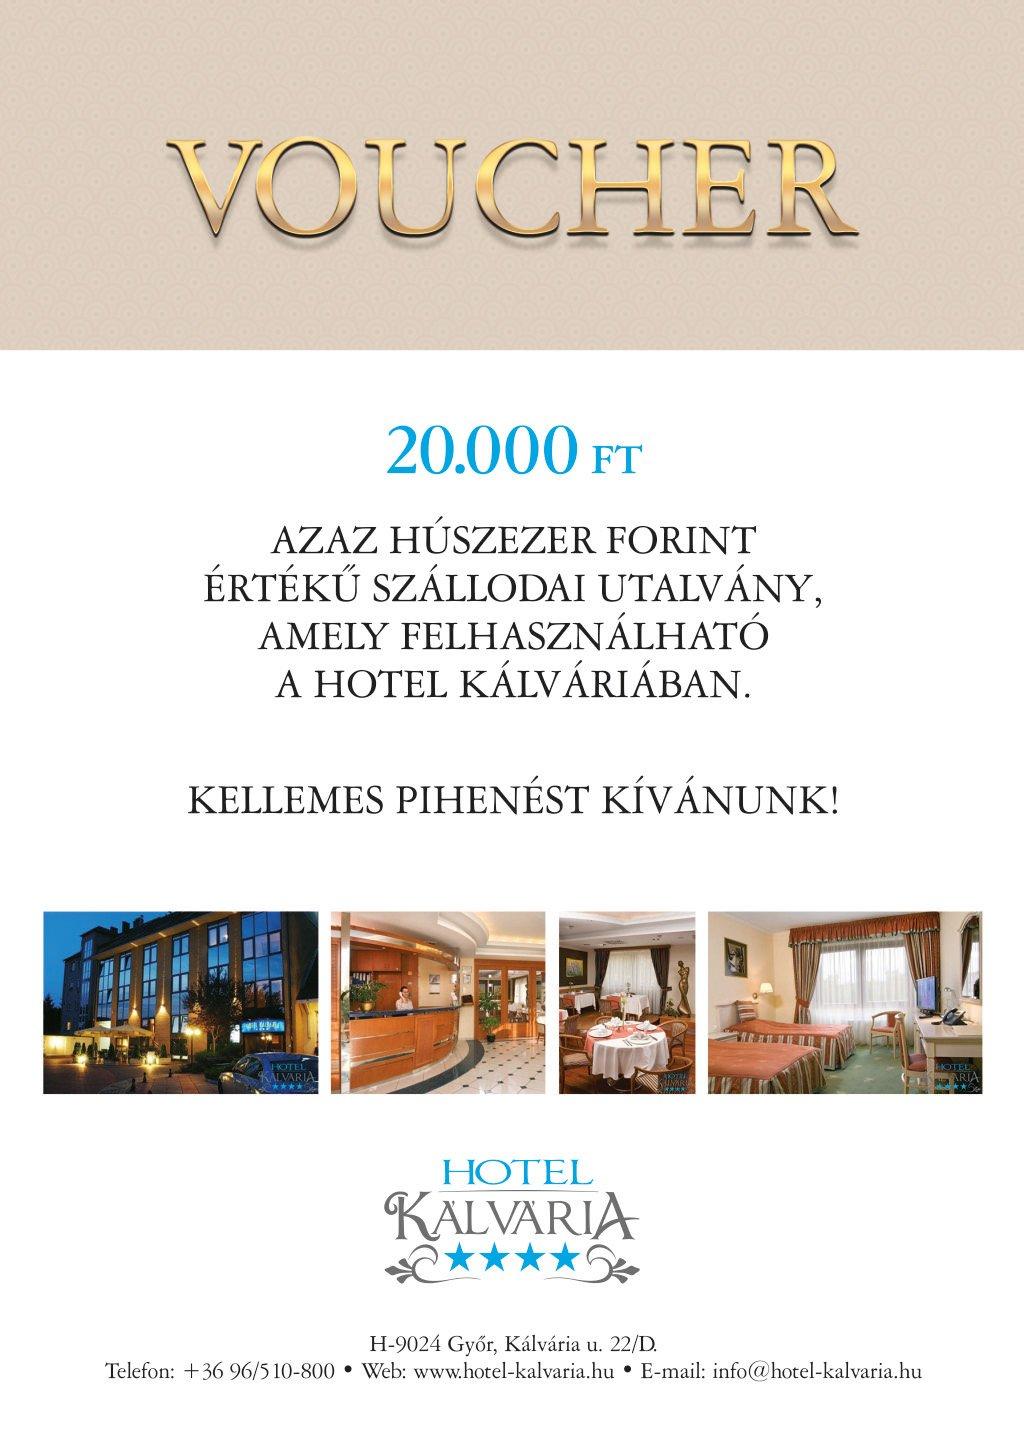 kalvaria_hotel_voucher_2017_20000